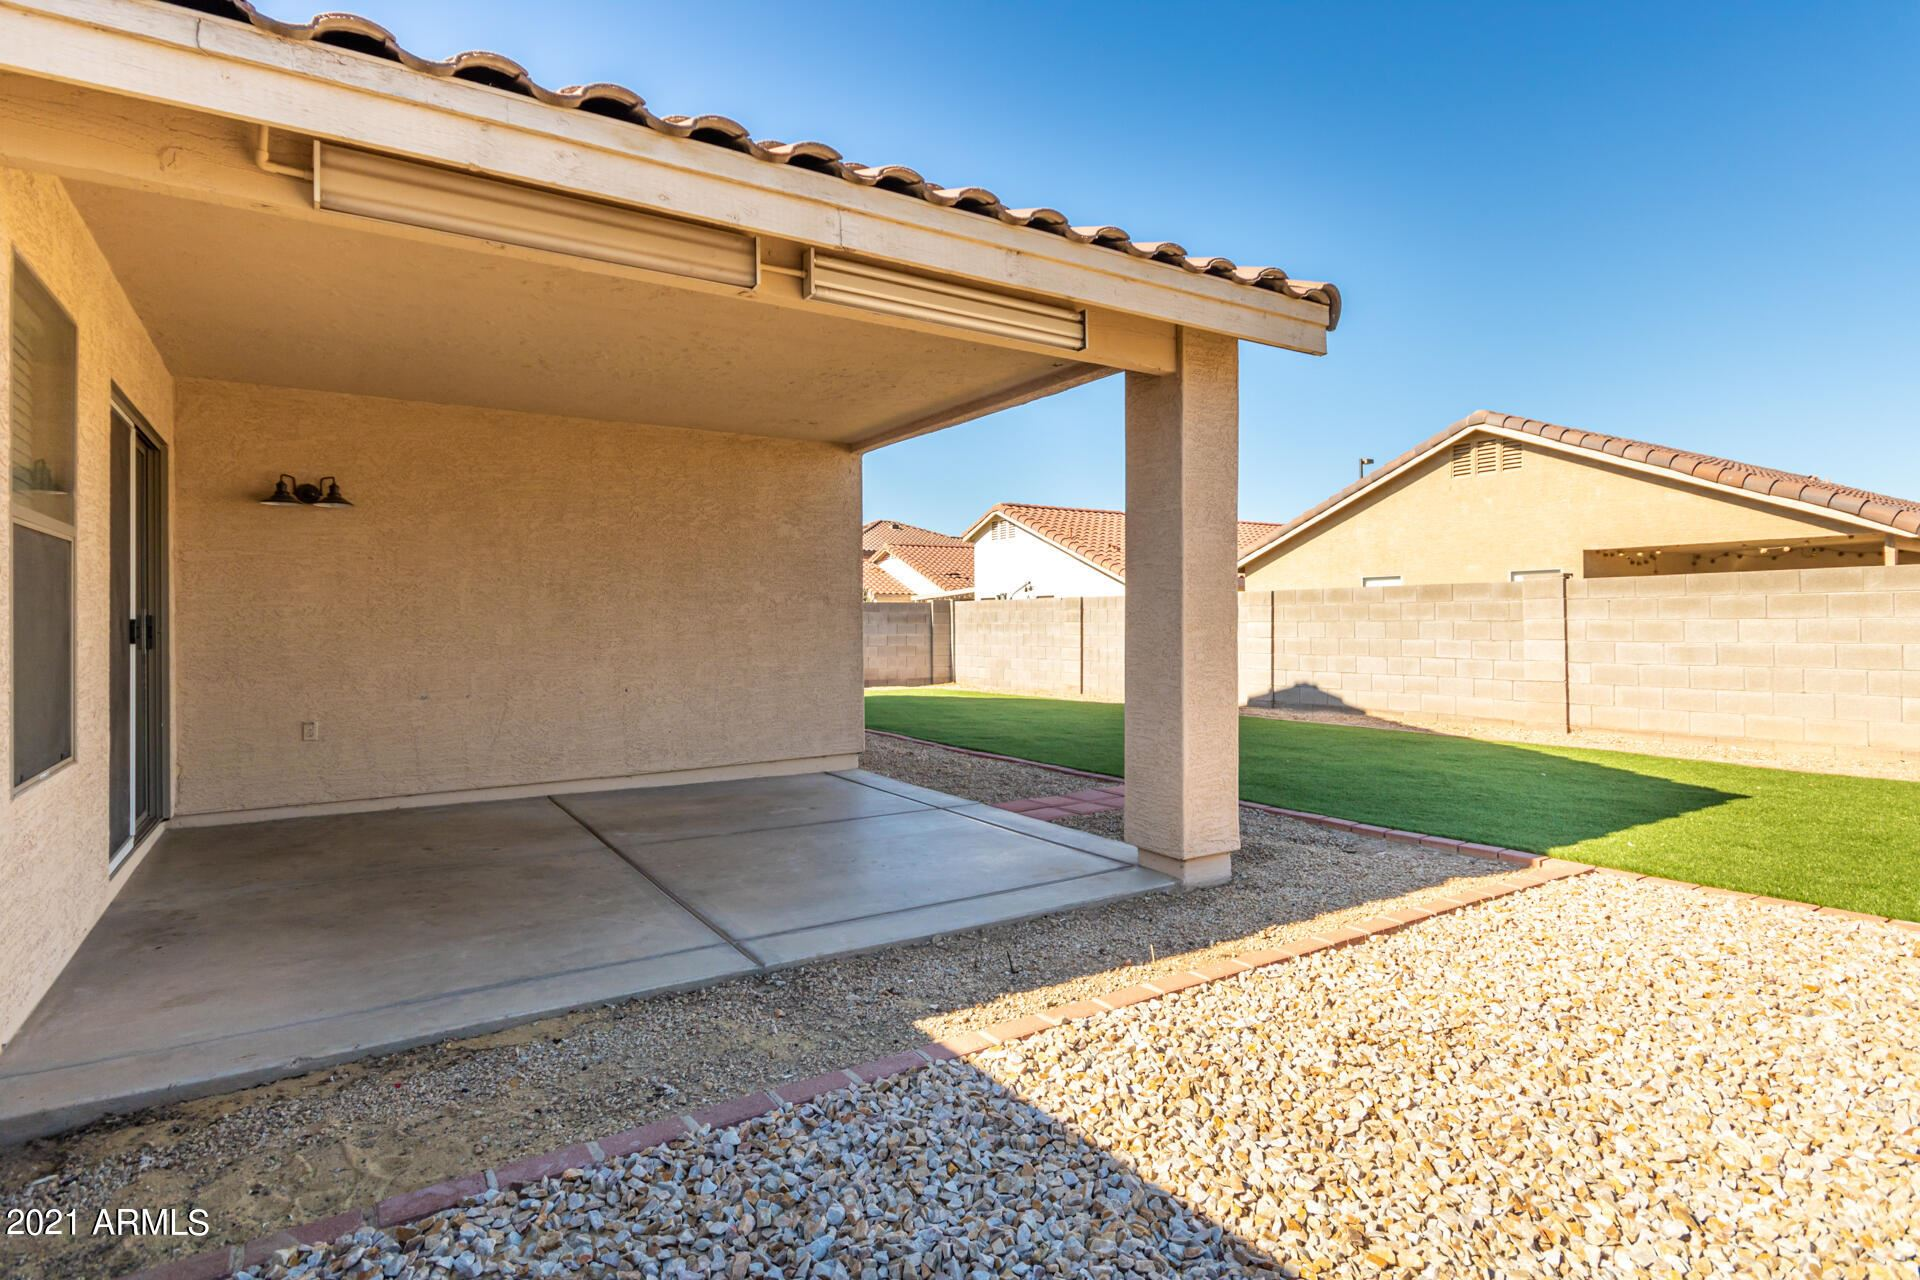 Photo of 636 S CONCORD Street, Gilbert, AZ 85296 (MLS # 6306009)